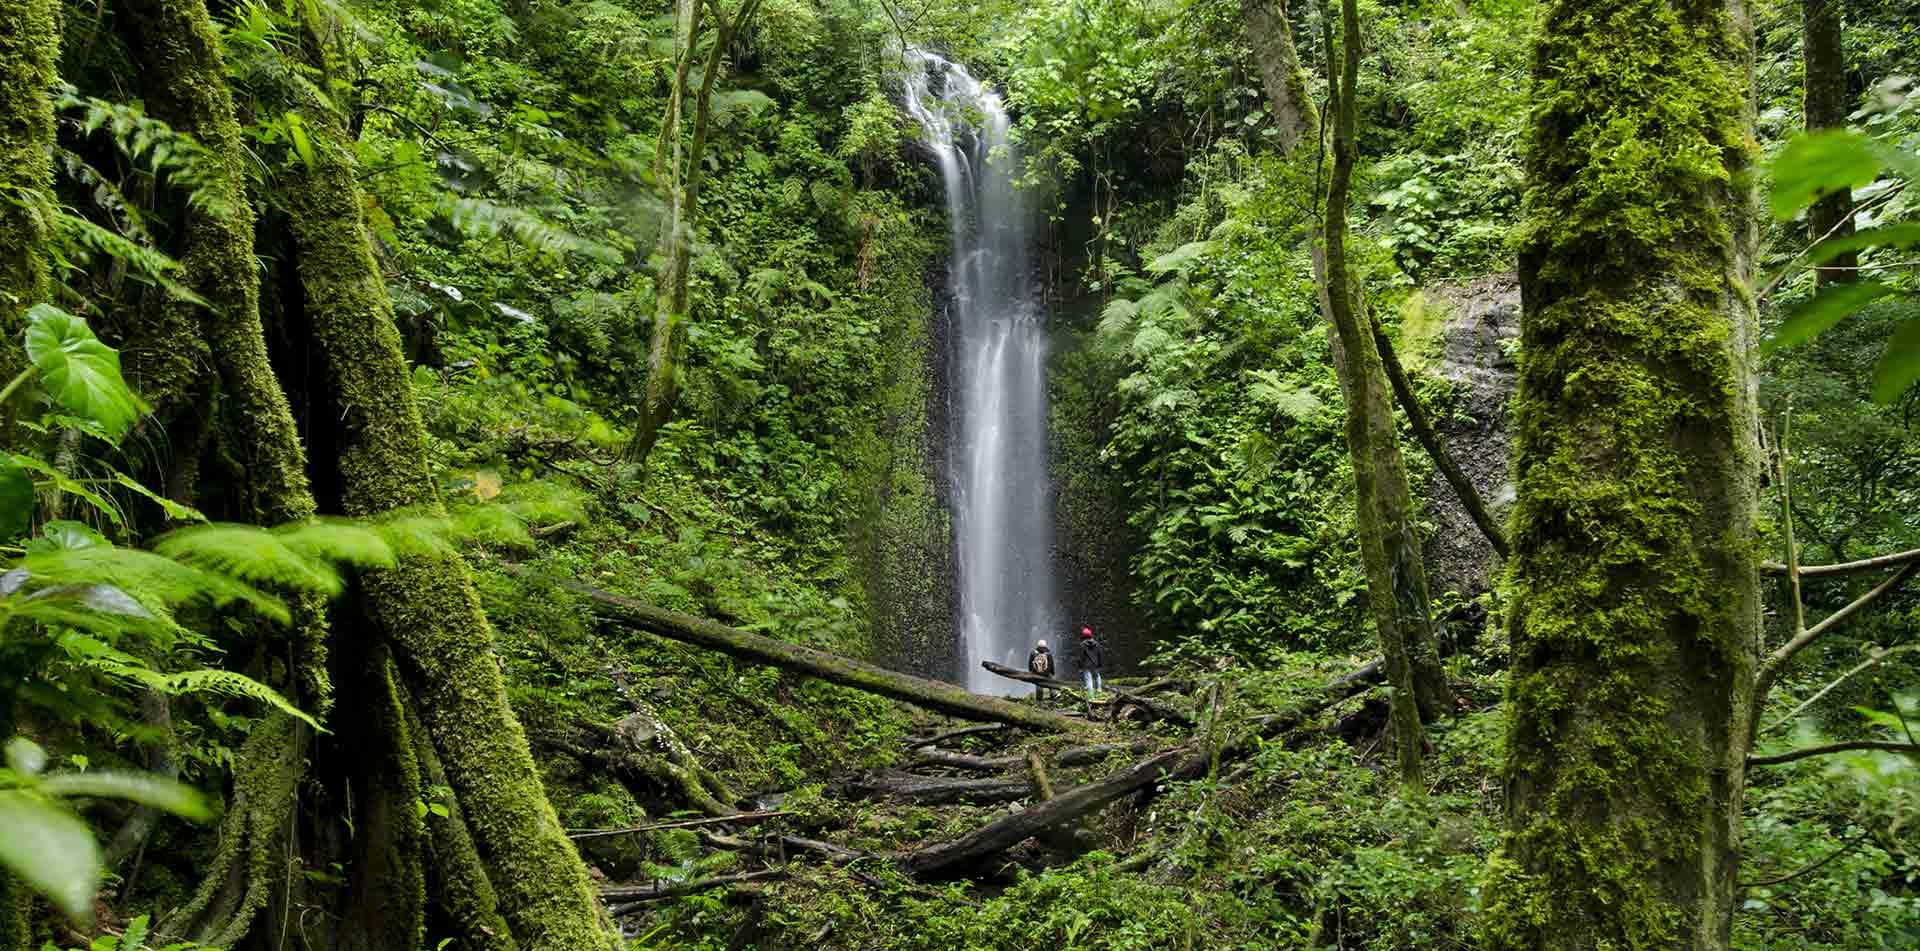 Waterfall in La Amistad, Panama